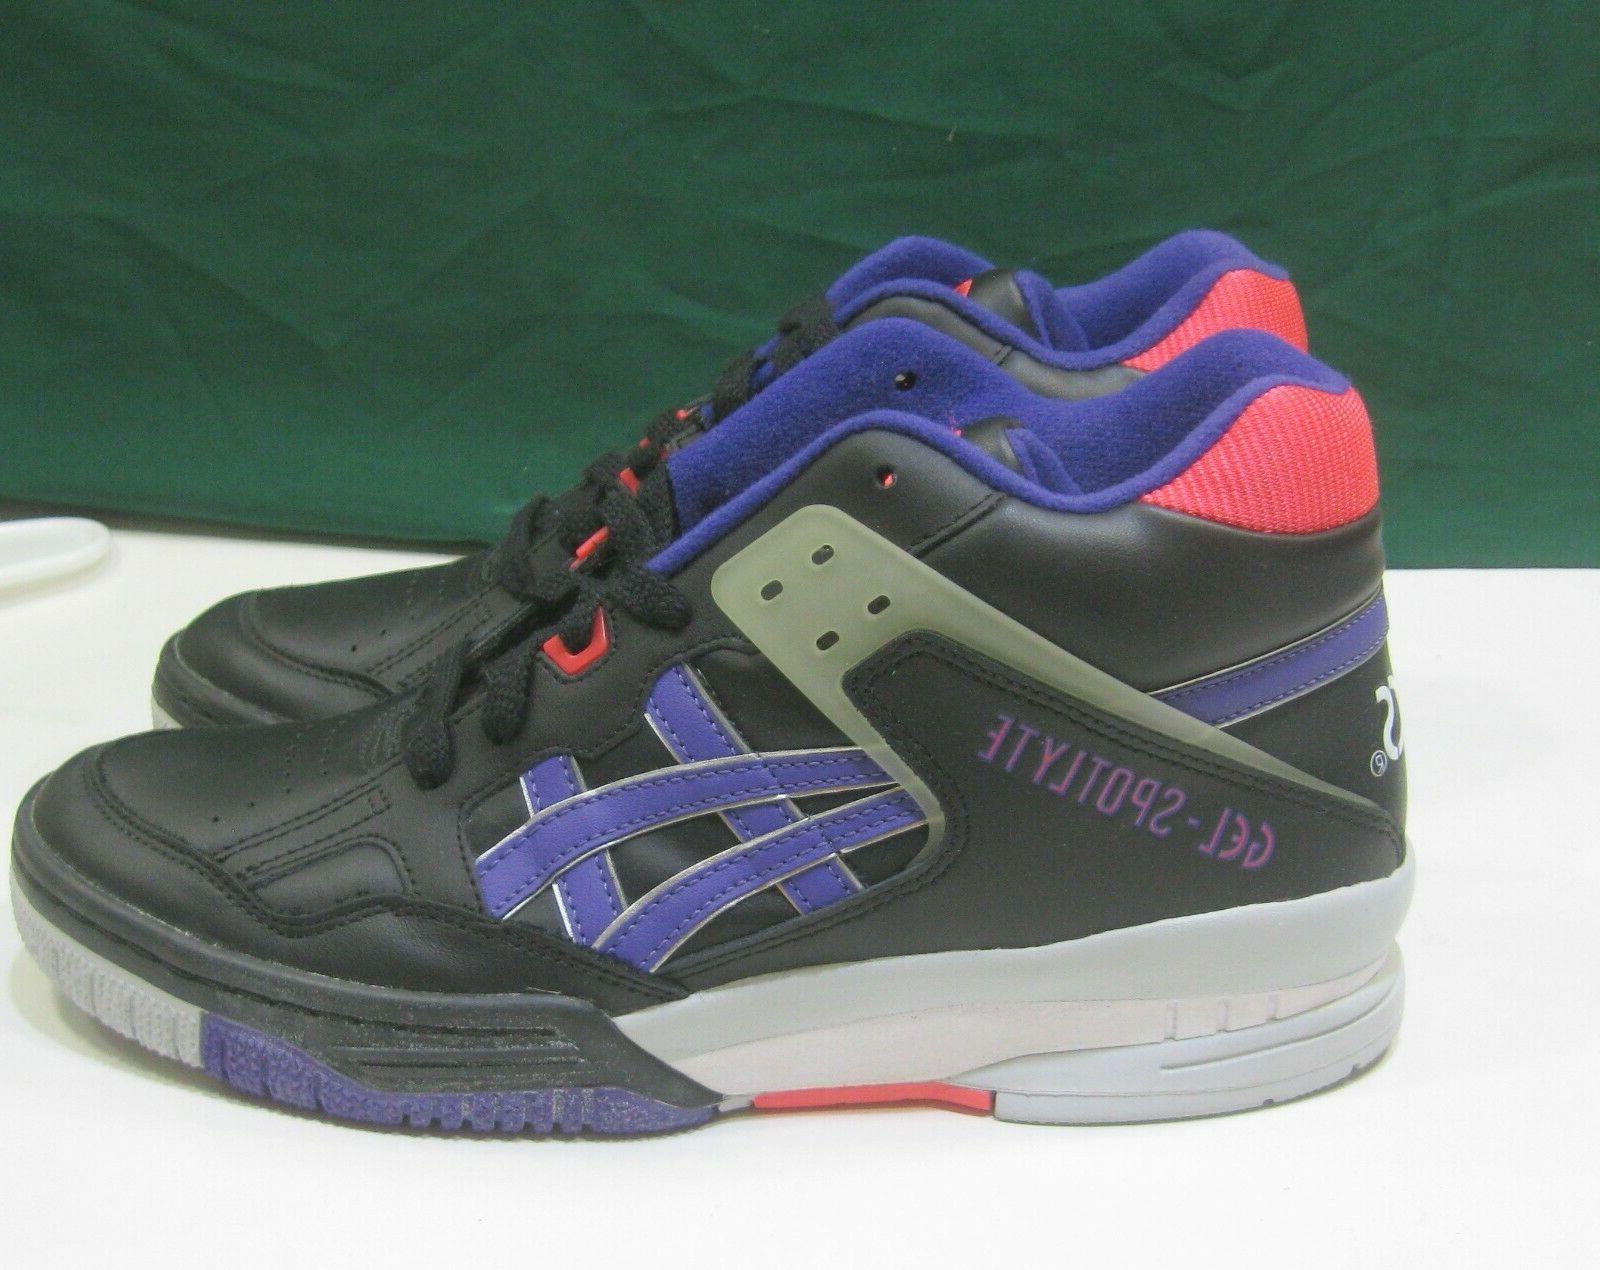 new gel spotlyte retro basketball shoes white